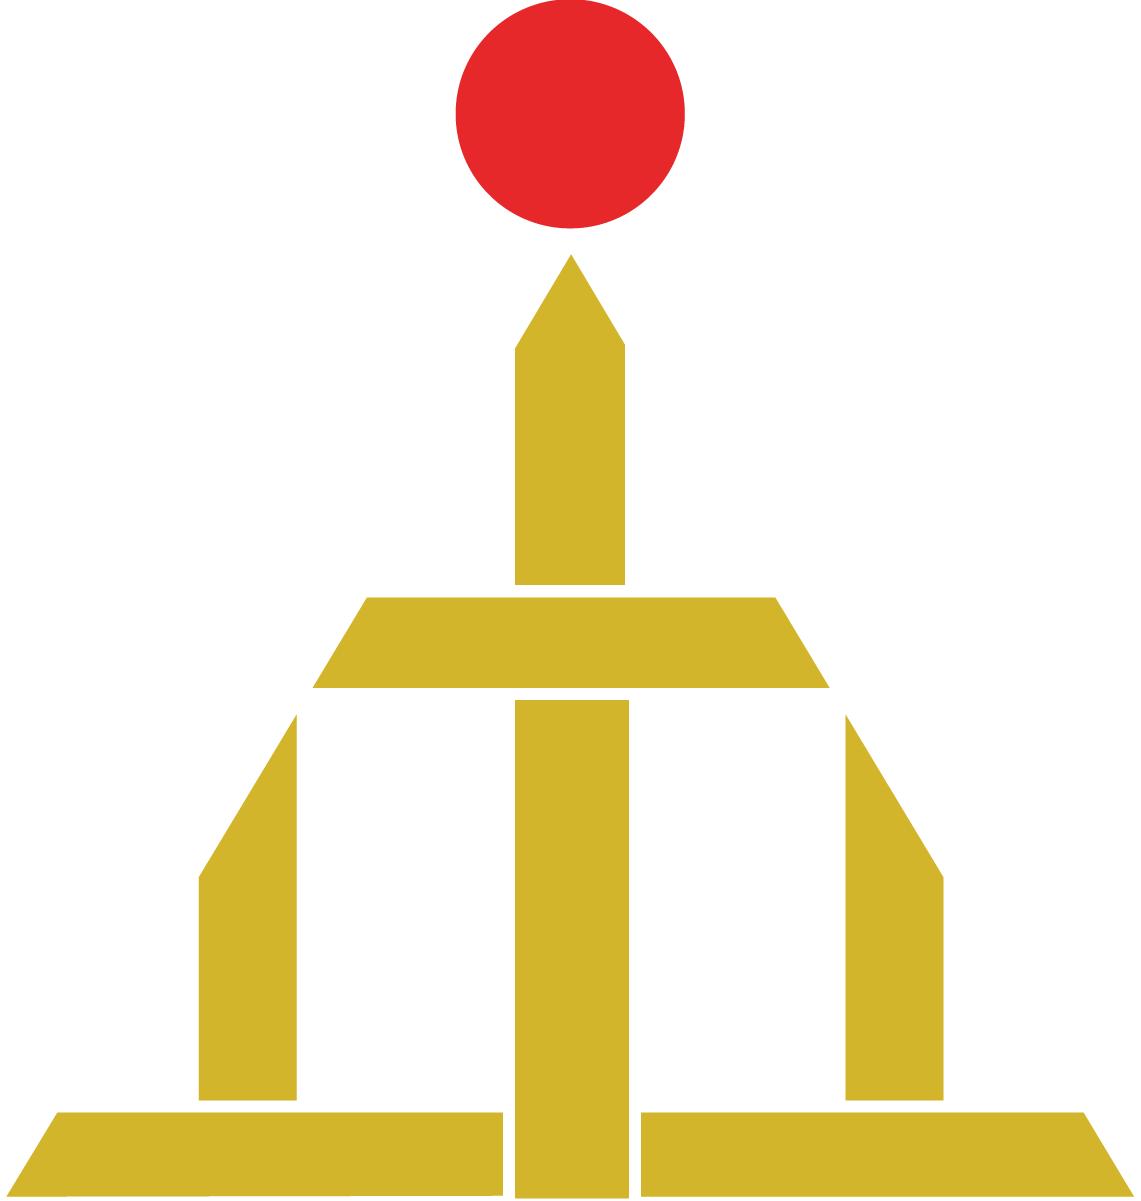 IIIT (Indian Institute of Information Technology), Bhagalpur